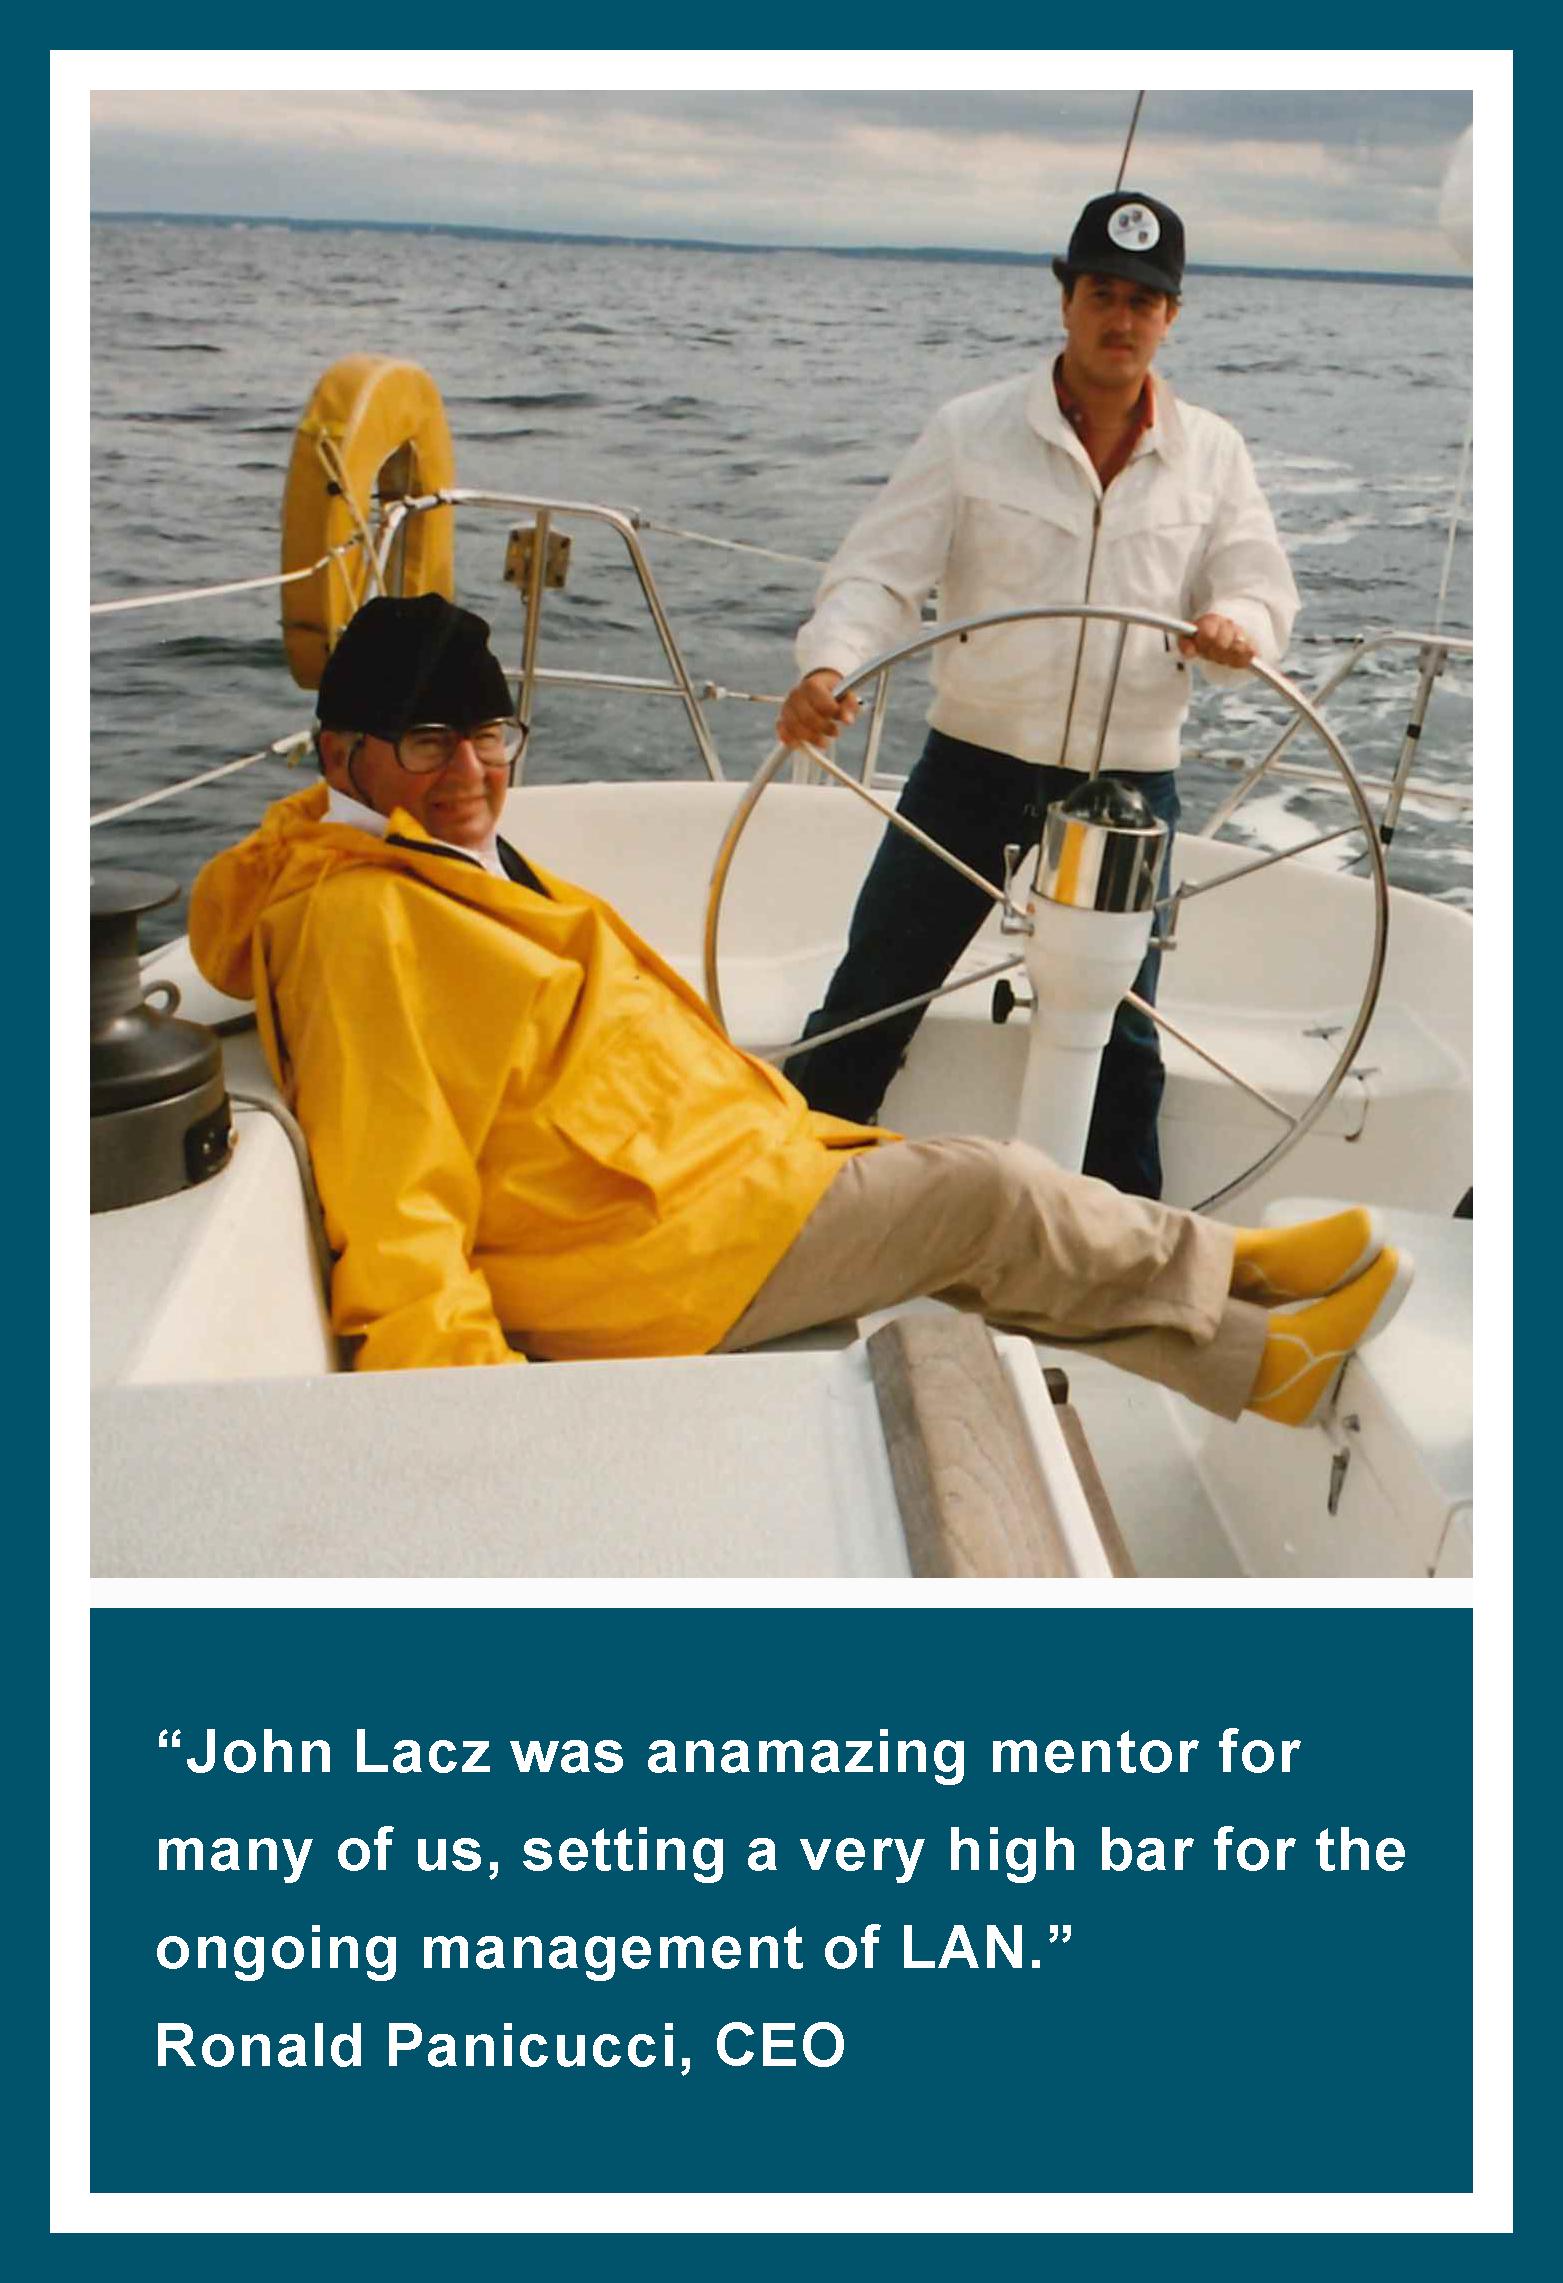 LAN CEO Ronald Panicucci and LAN Founder John Lacz